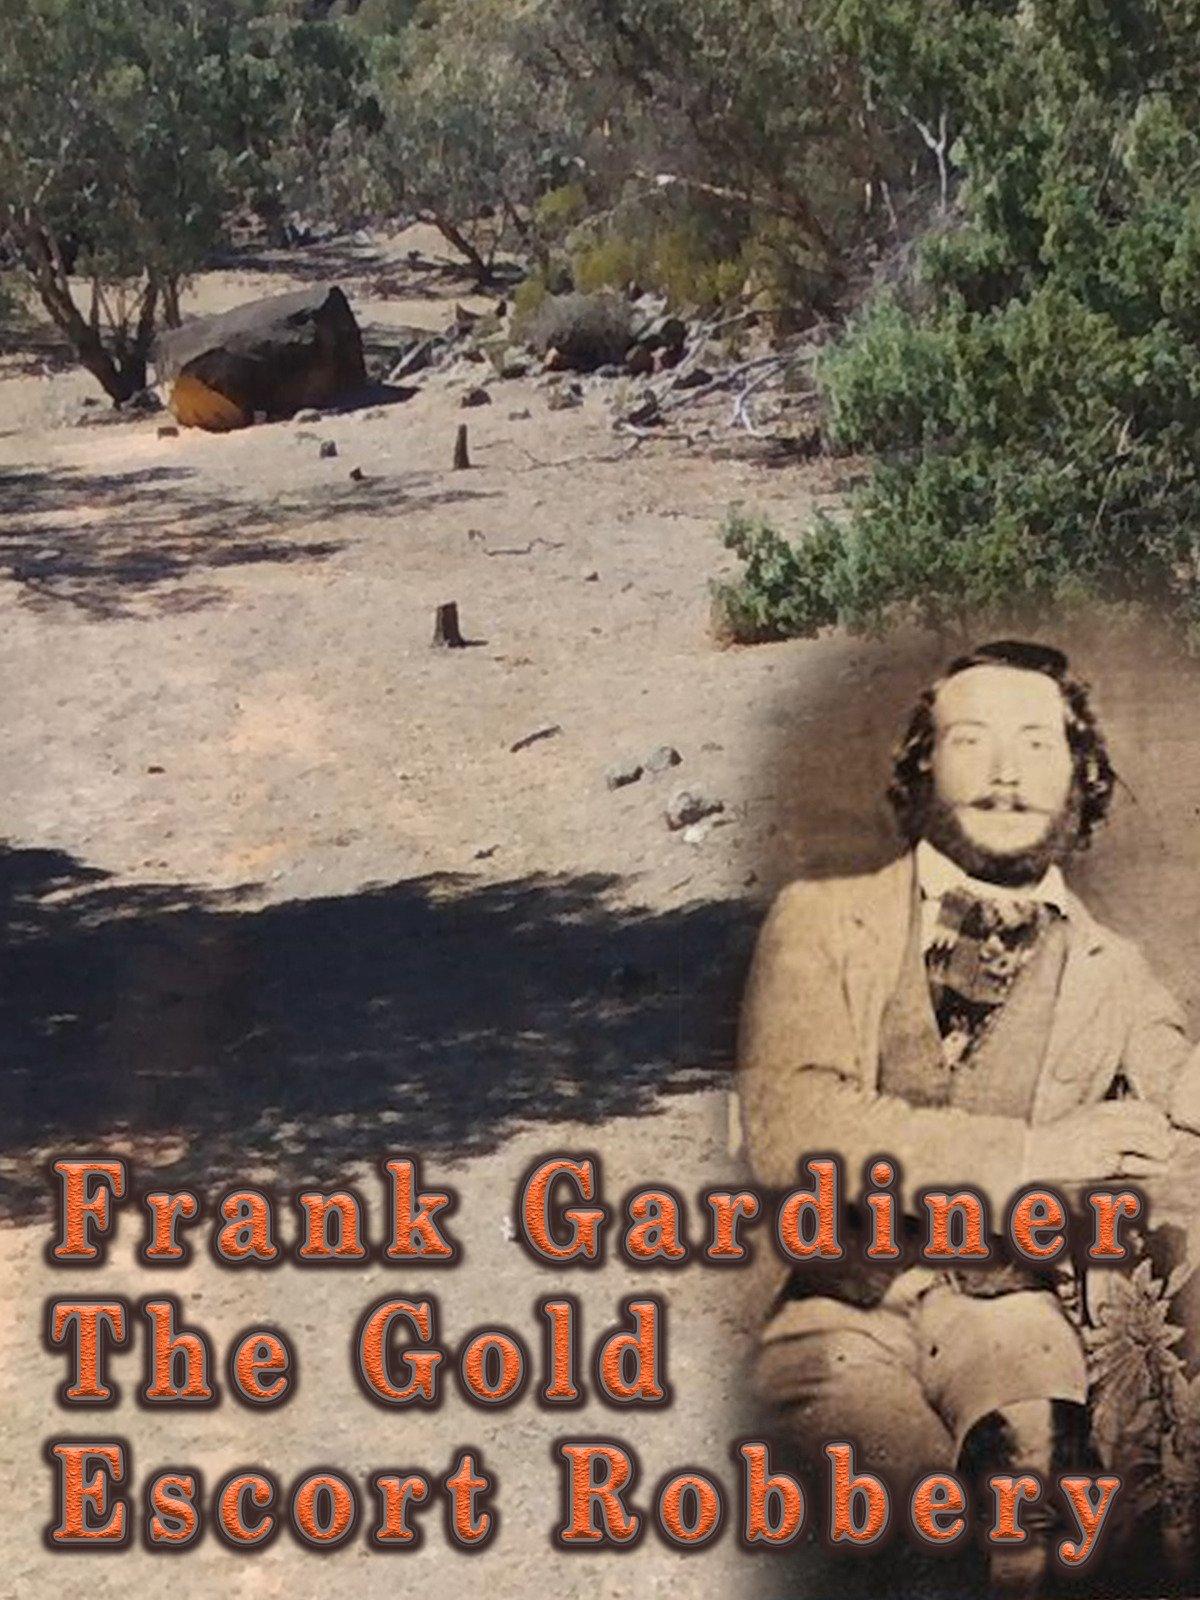 Frank Gardiner - The Gold Escort Robbery